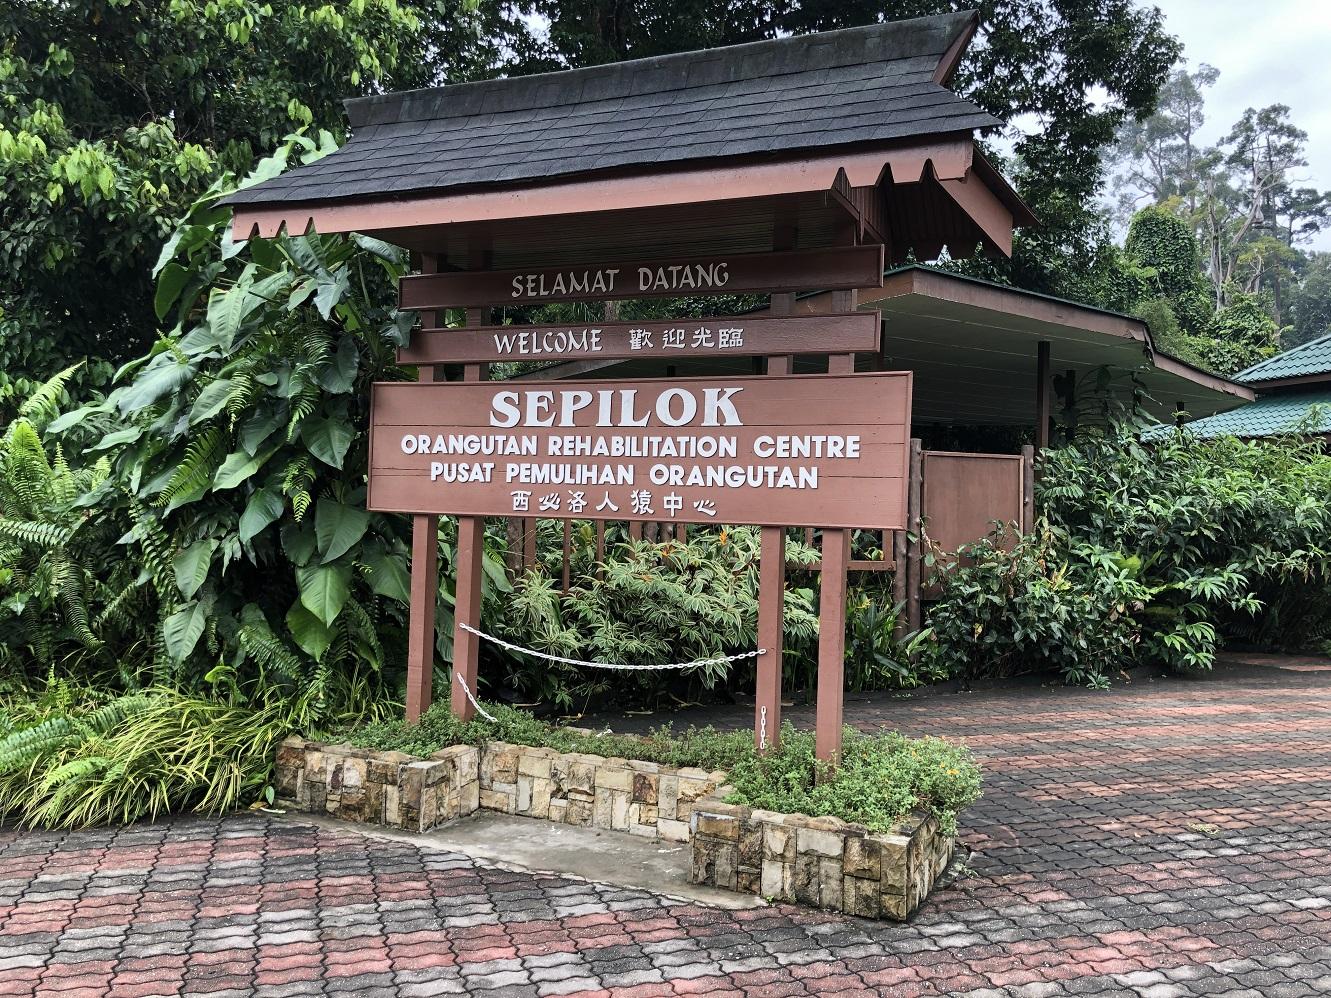 Visit the world famous Sepilok Orangutan Rehabilitation Centre